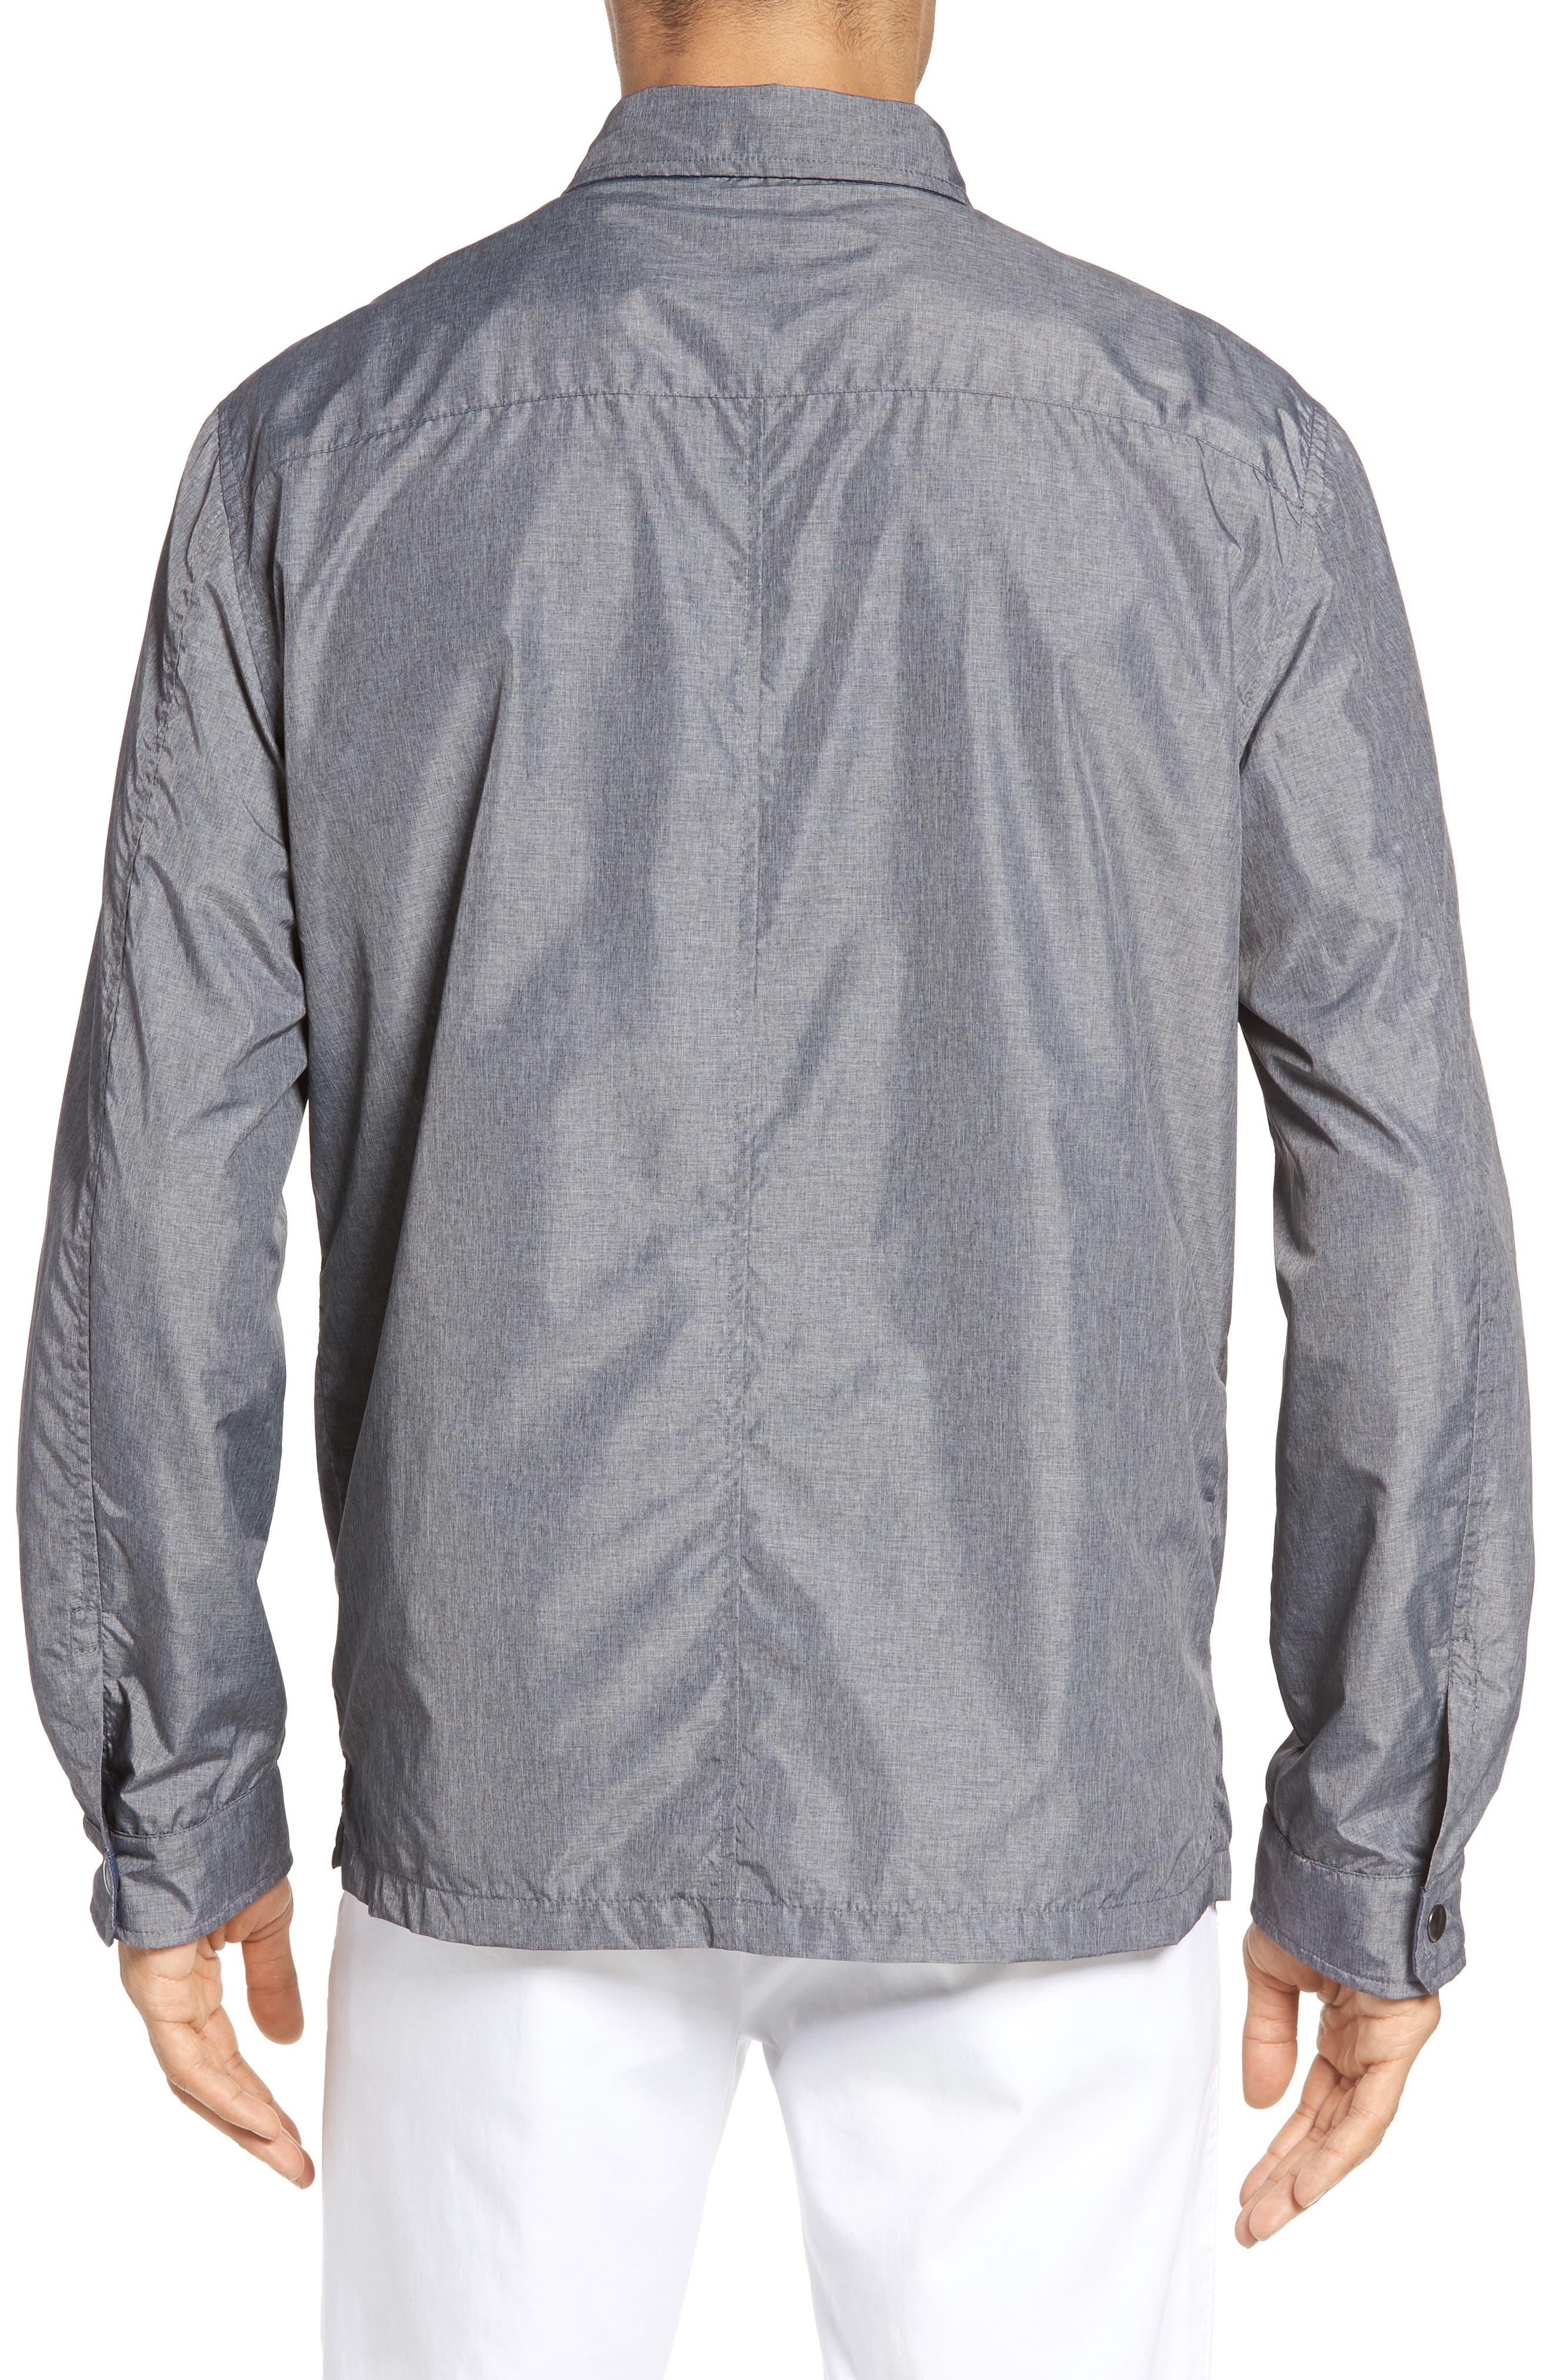 Alternate Image 2  - Zachary Prell Aronia Snap Front Jacket